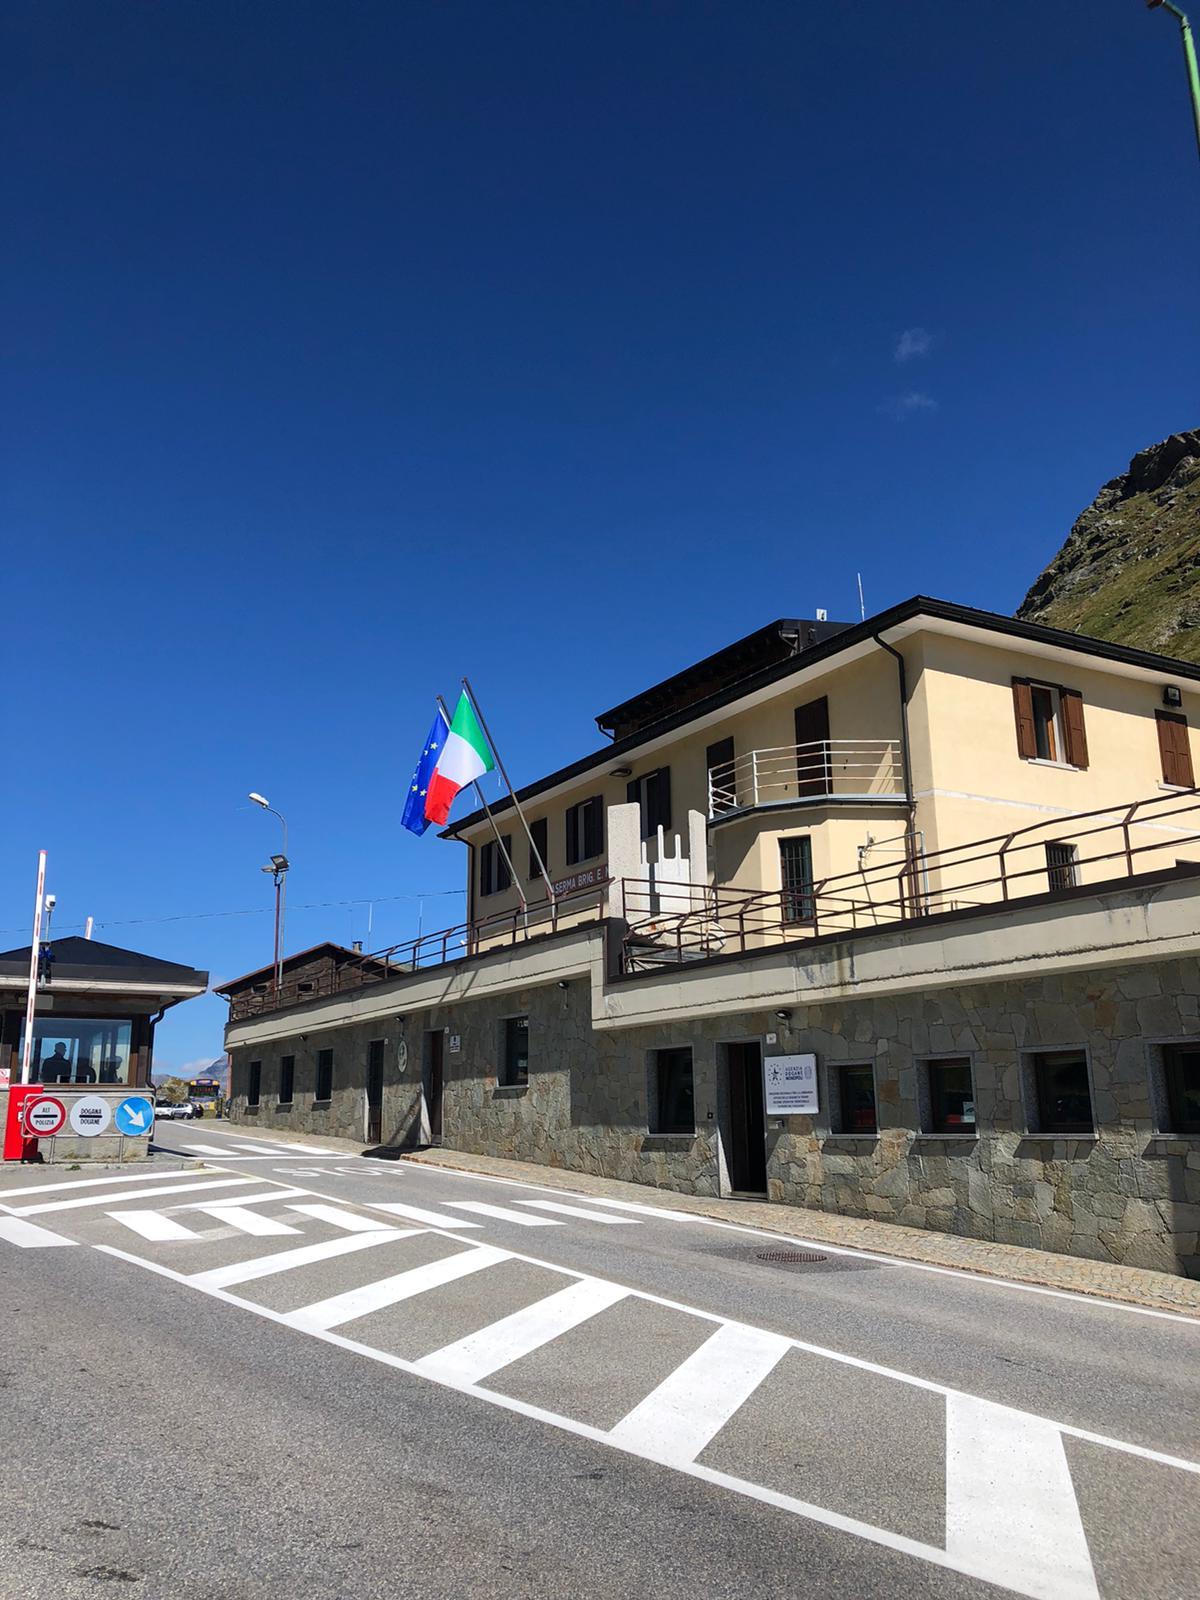 The Swiss-Italian border